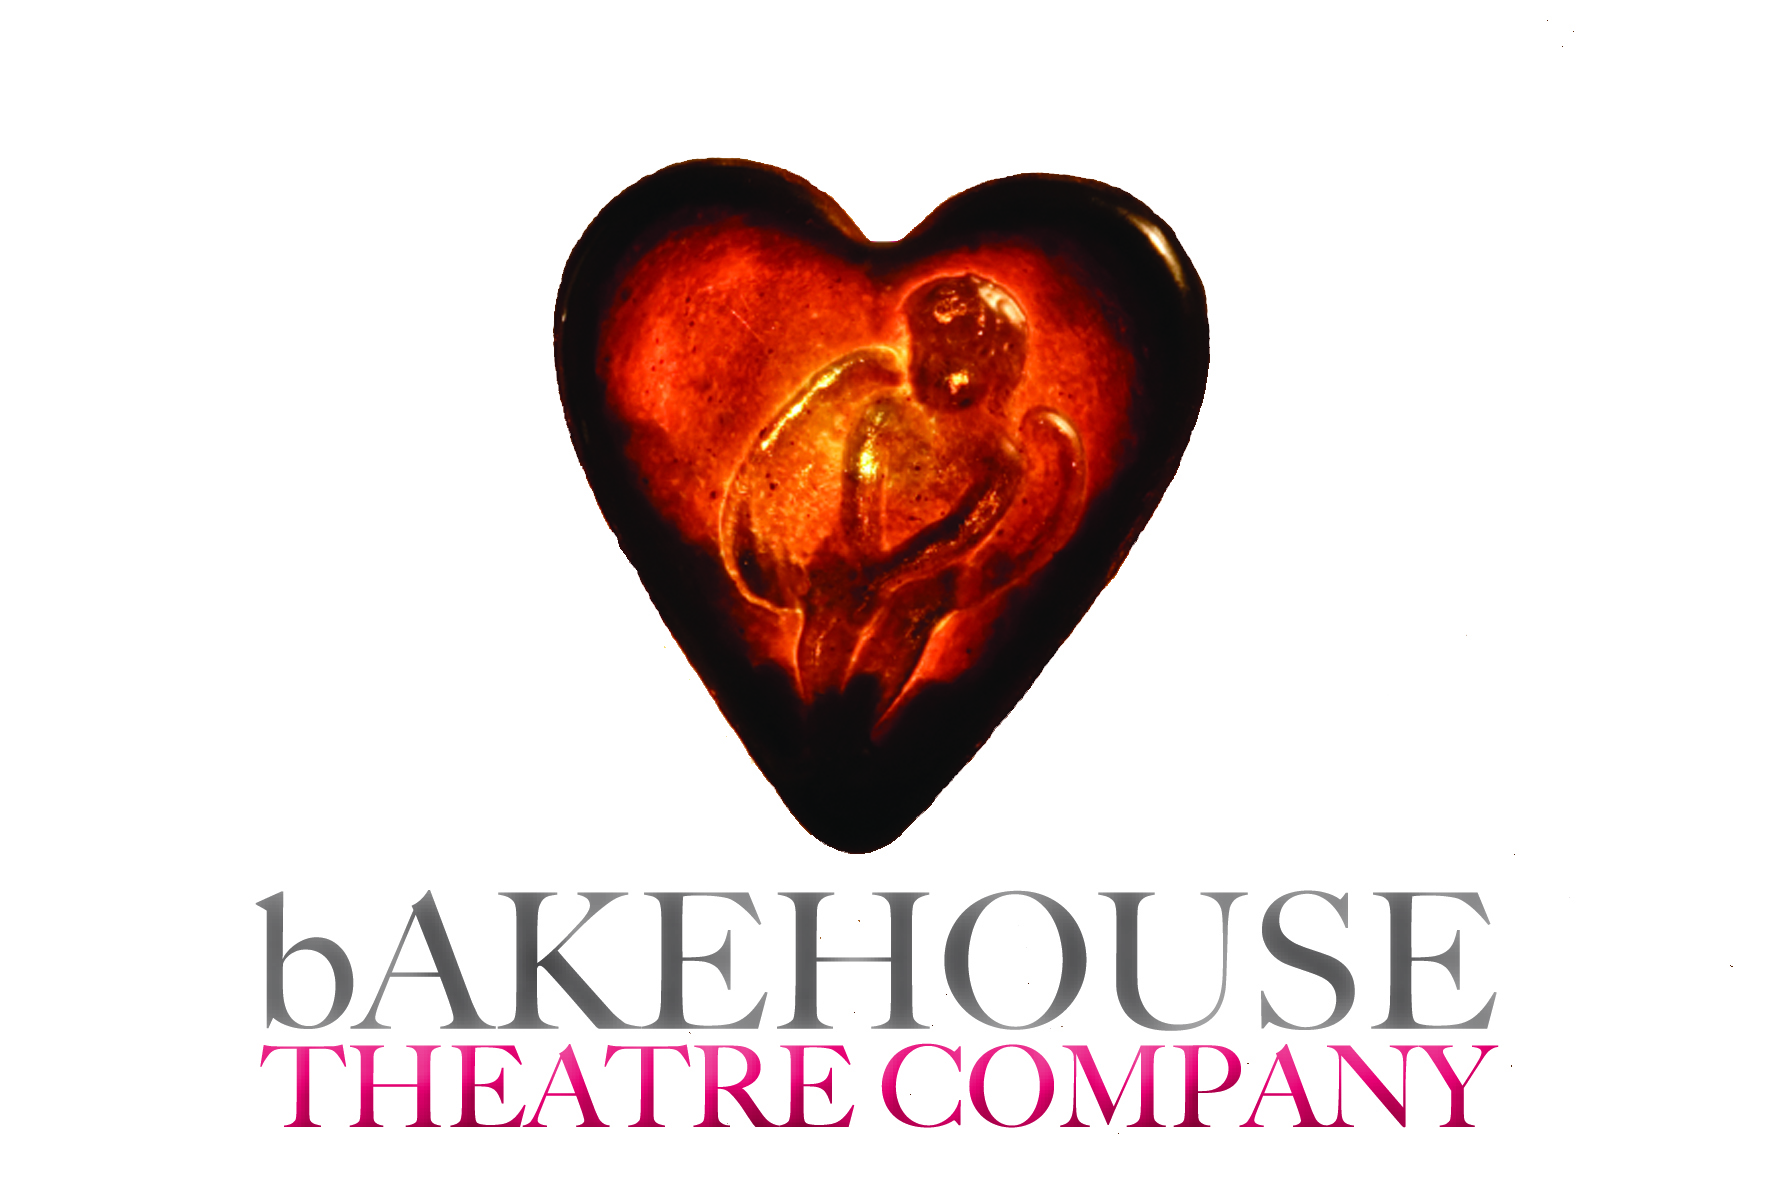 bakehouse logo transparent copy.jpg